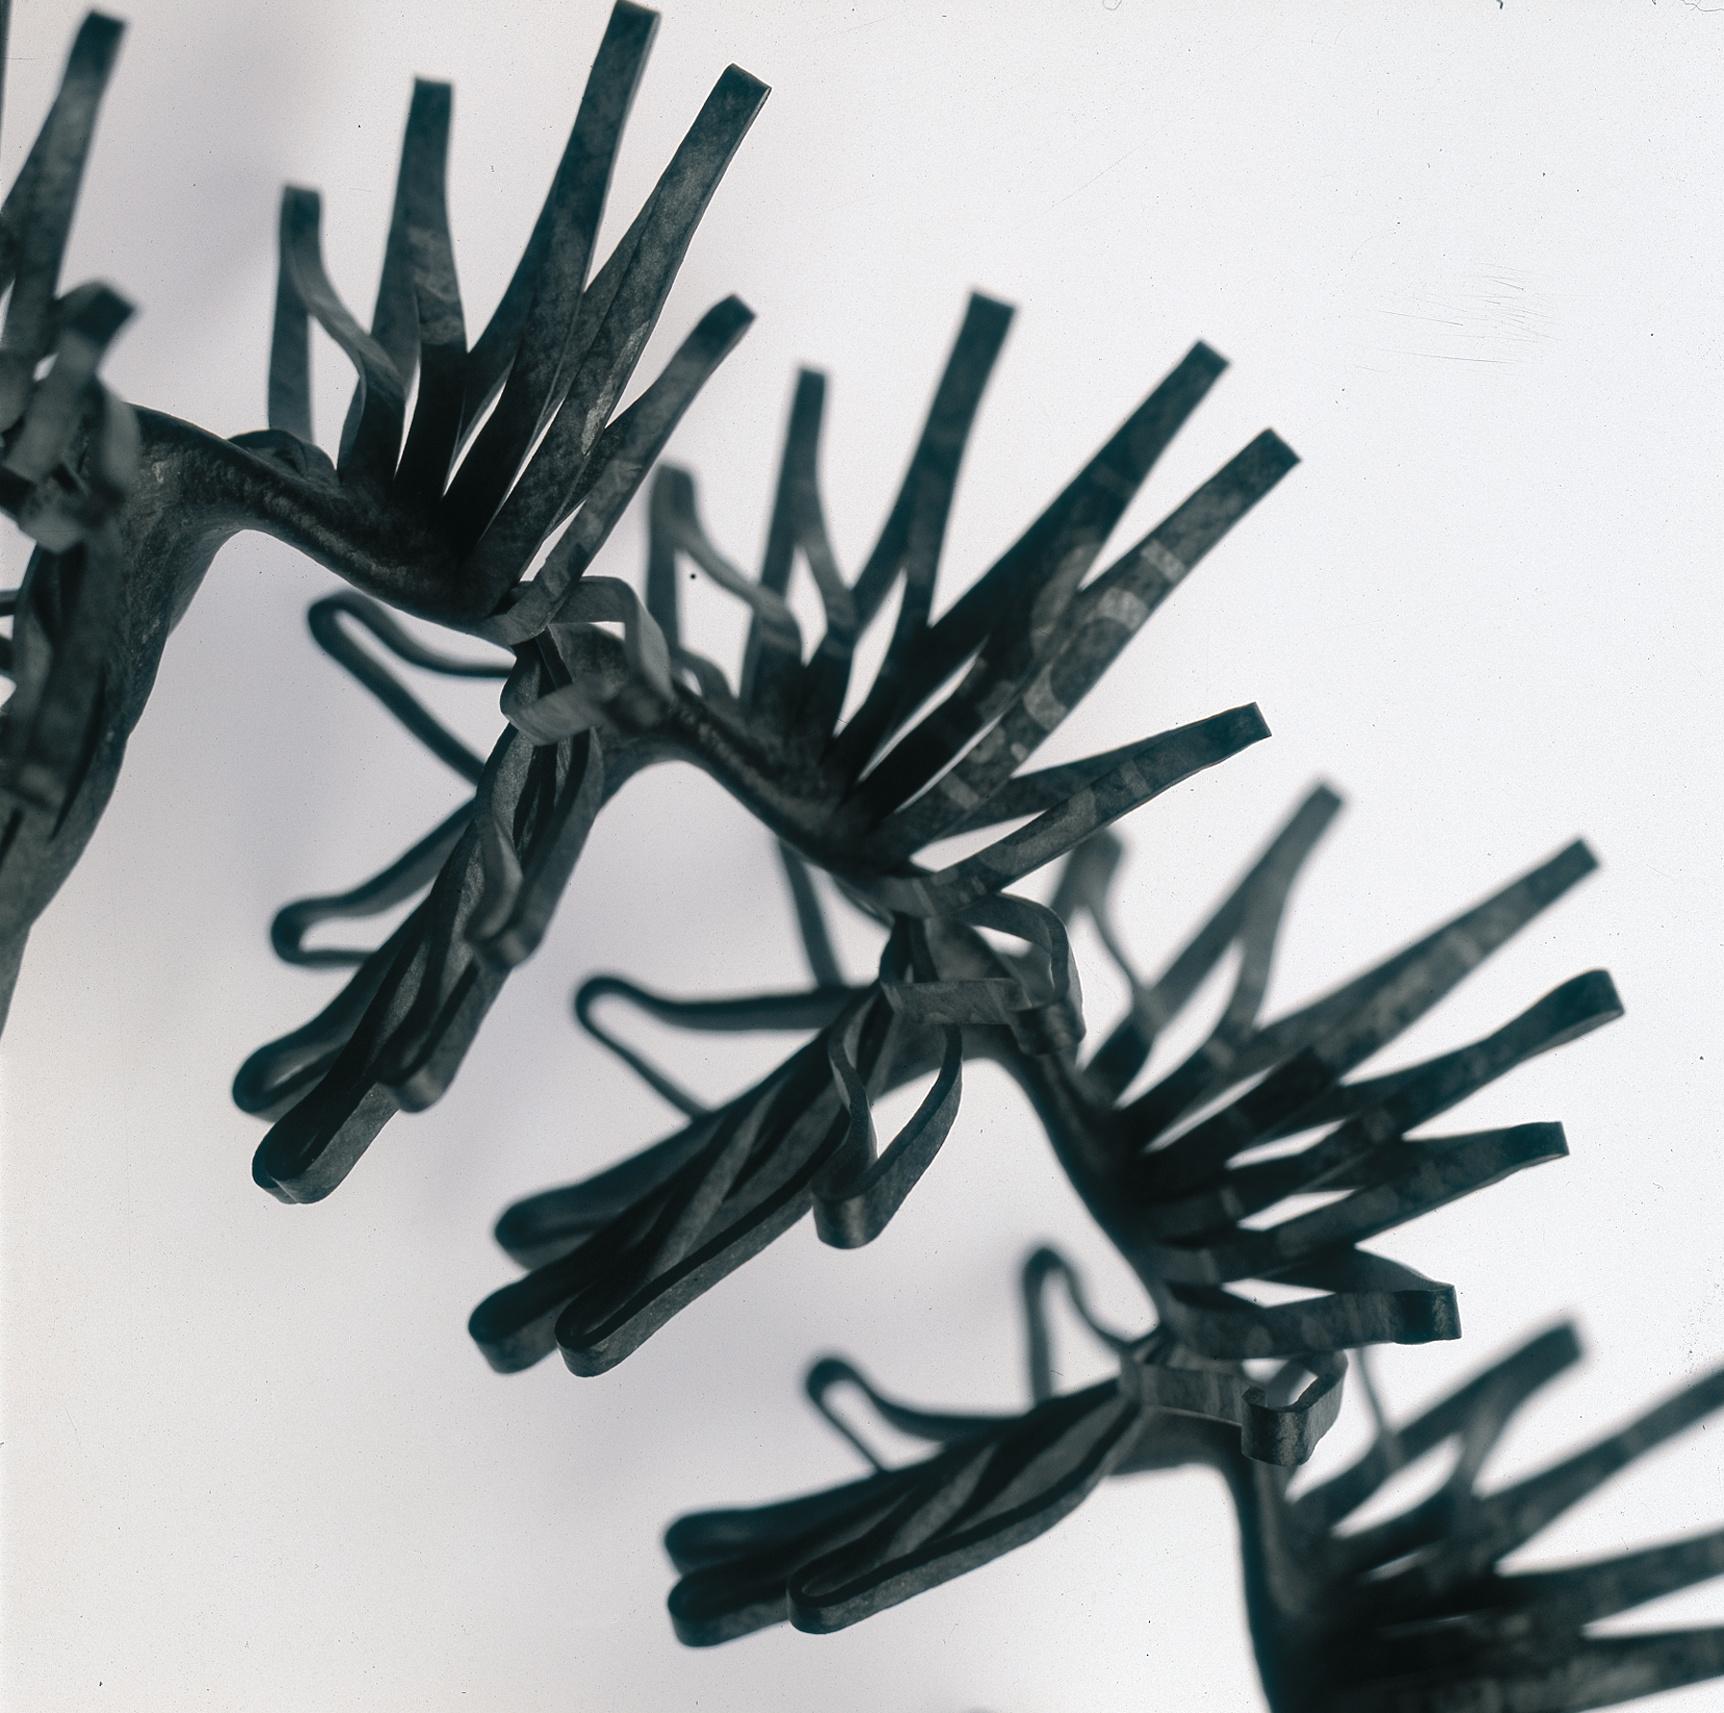 NECKLACE - CLOSE UP